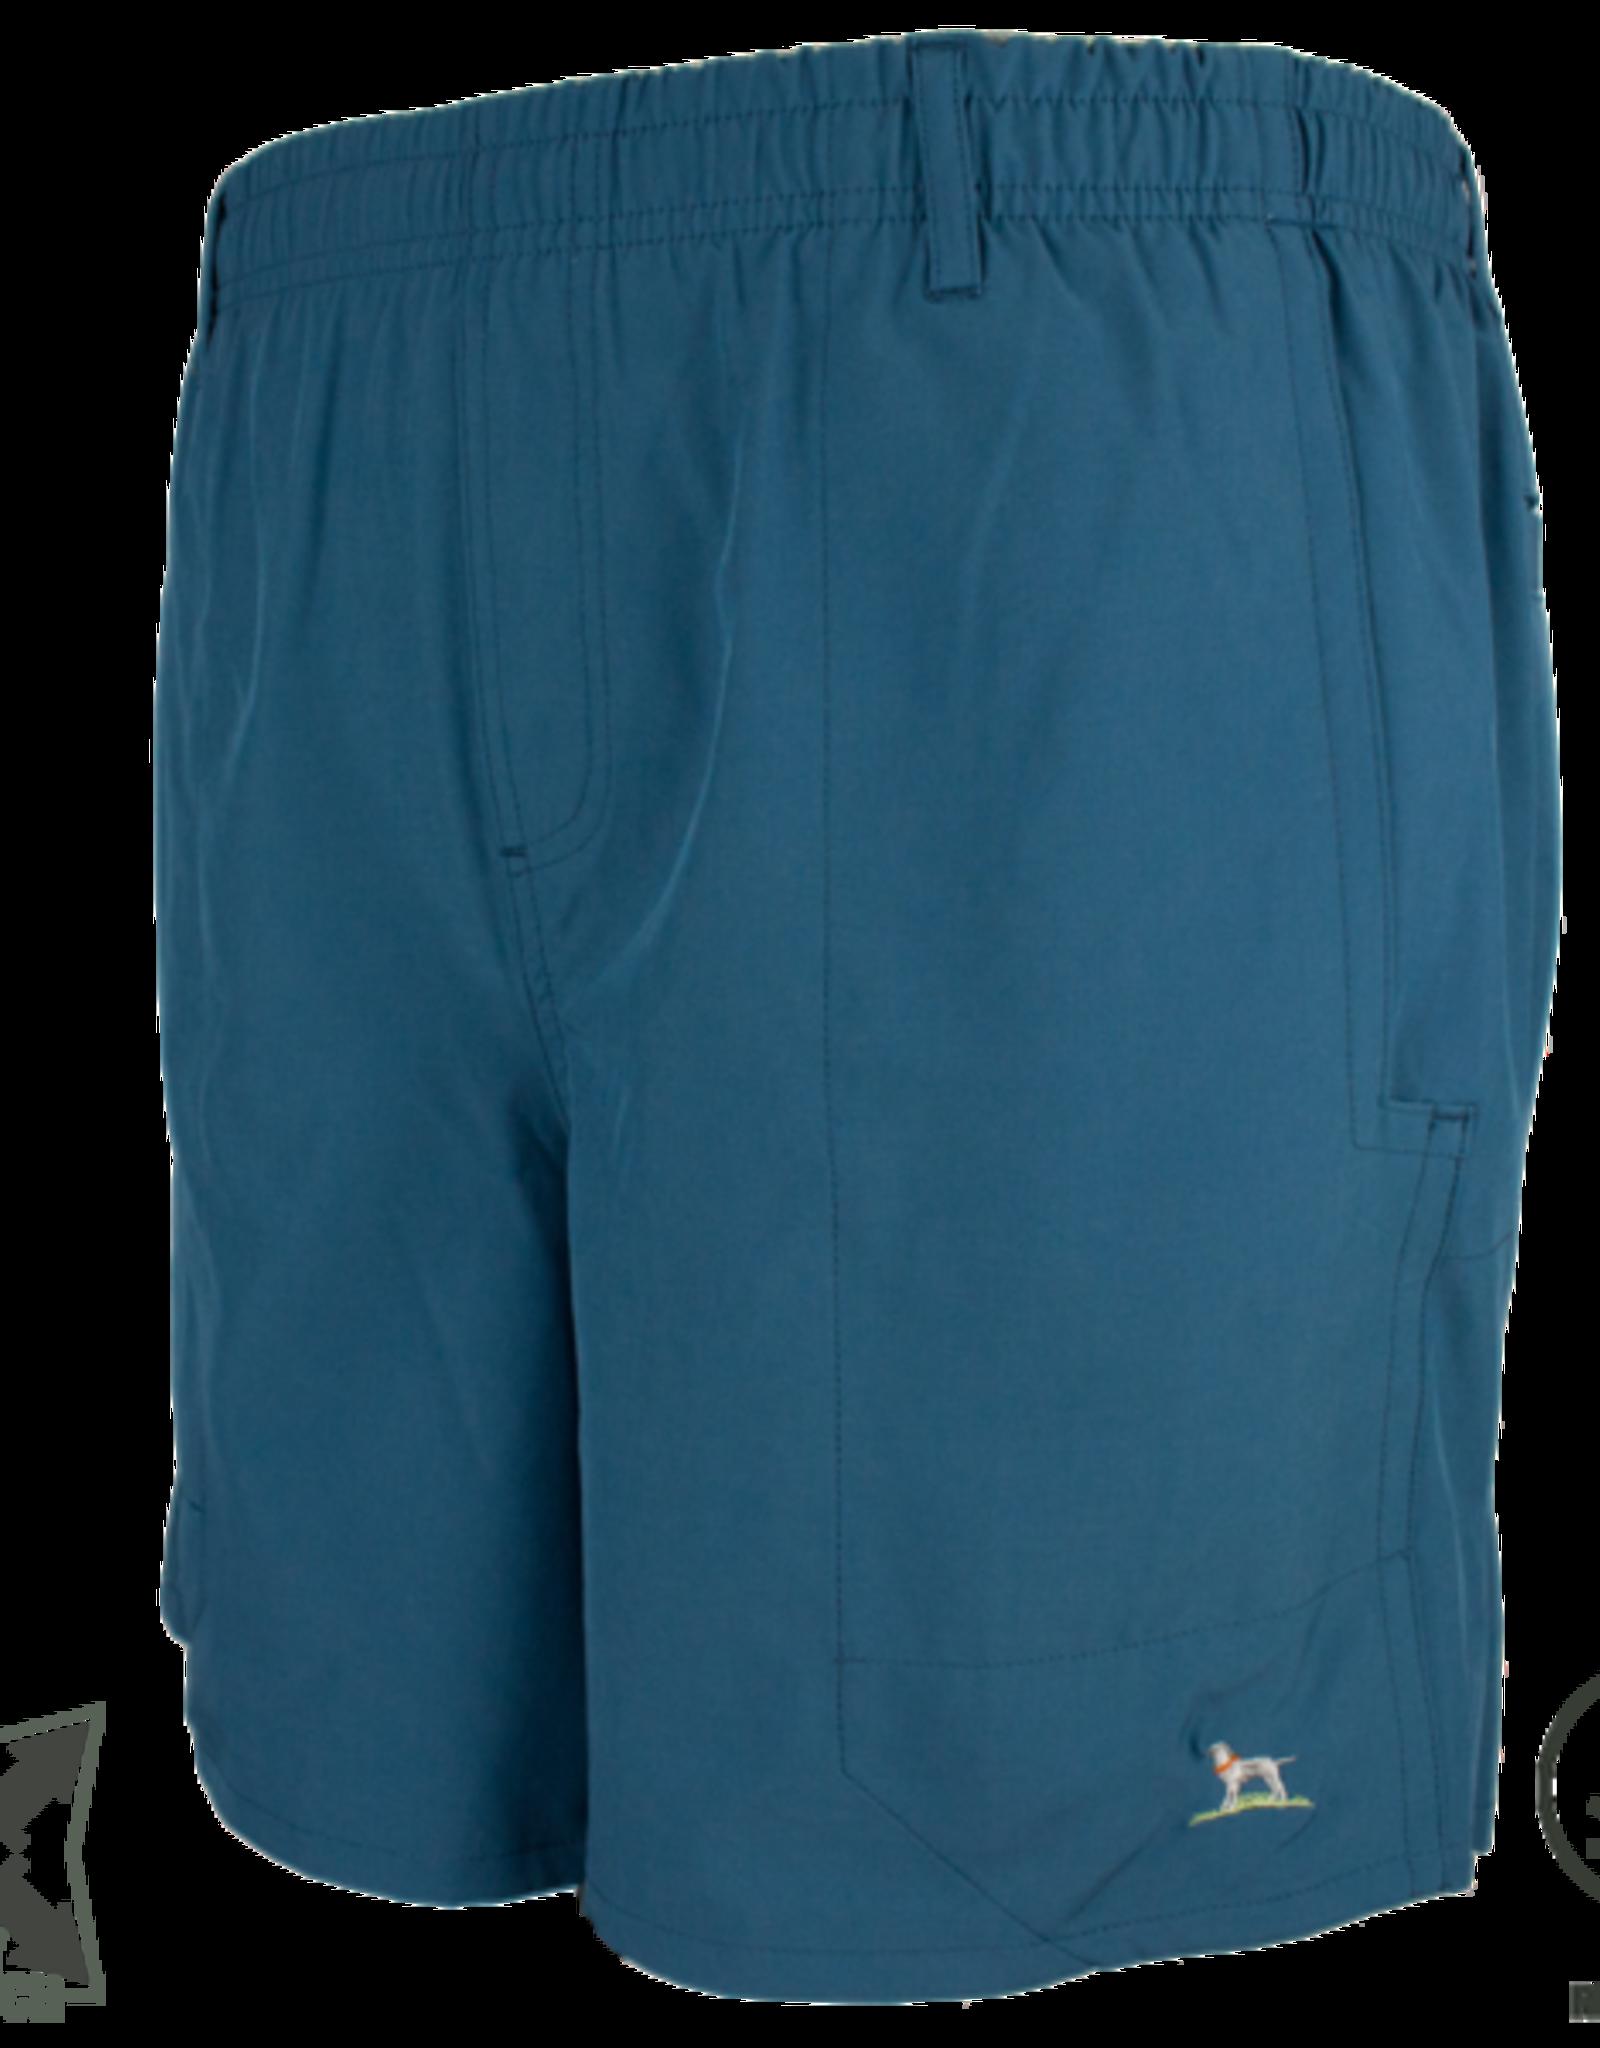 Over Under Clothing Shearwater Swim Shorts